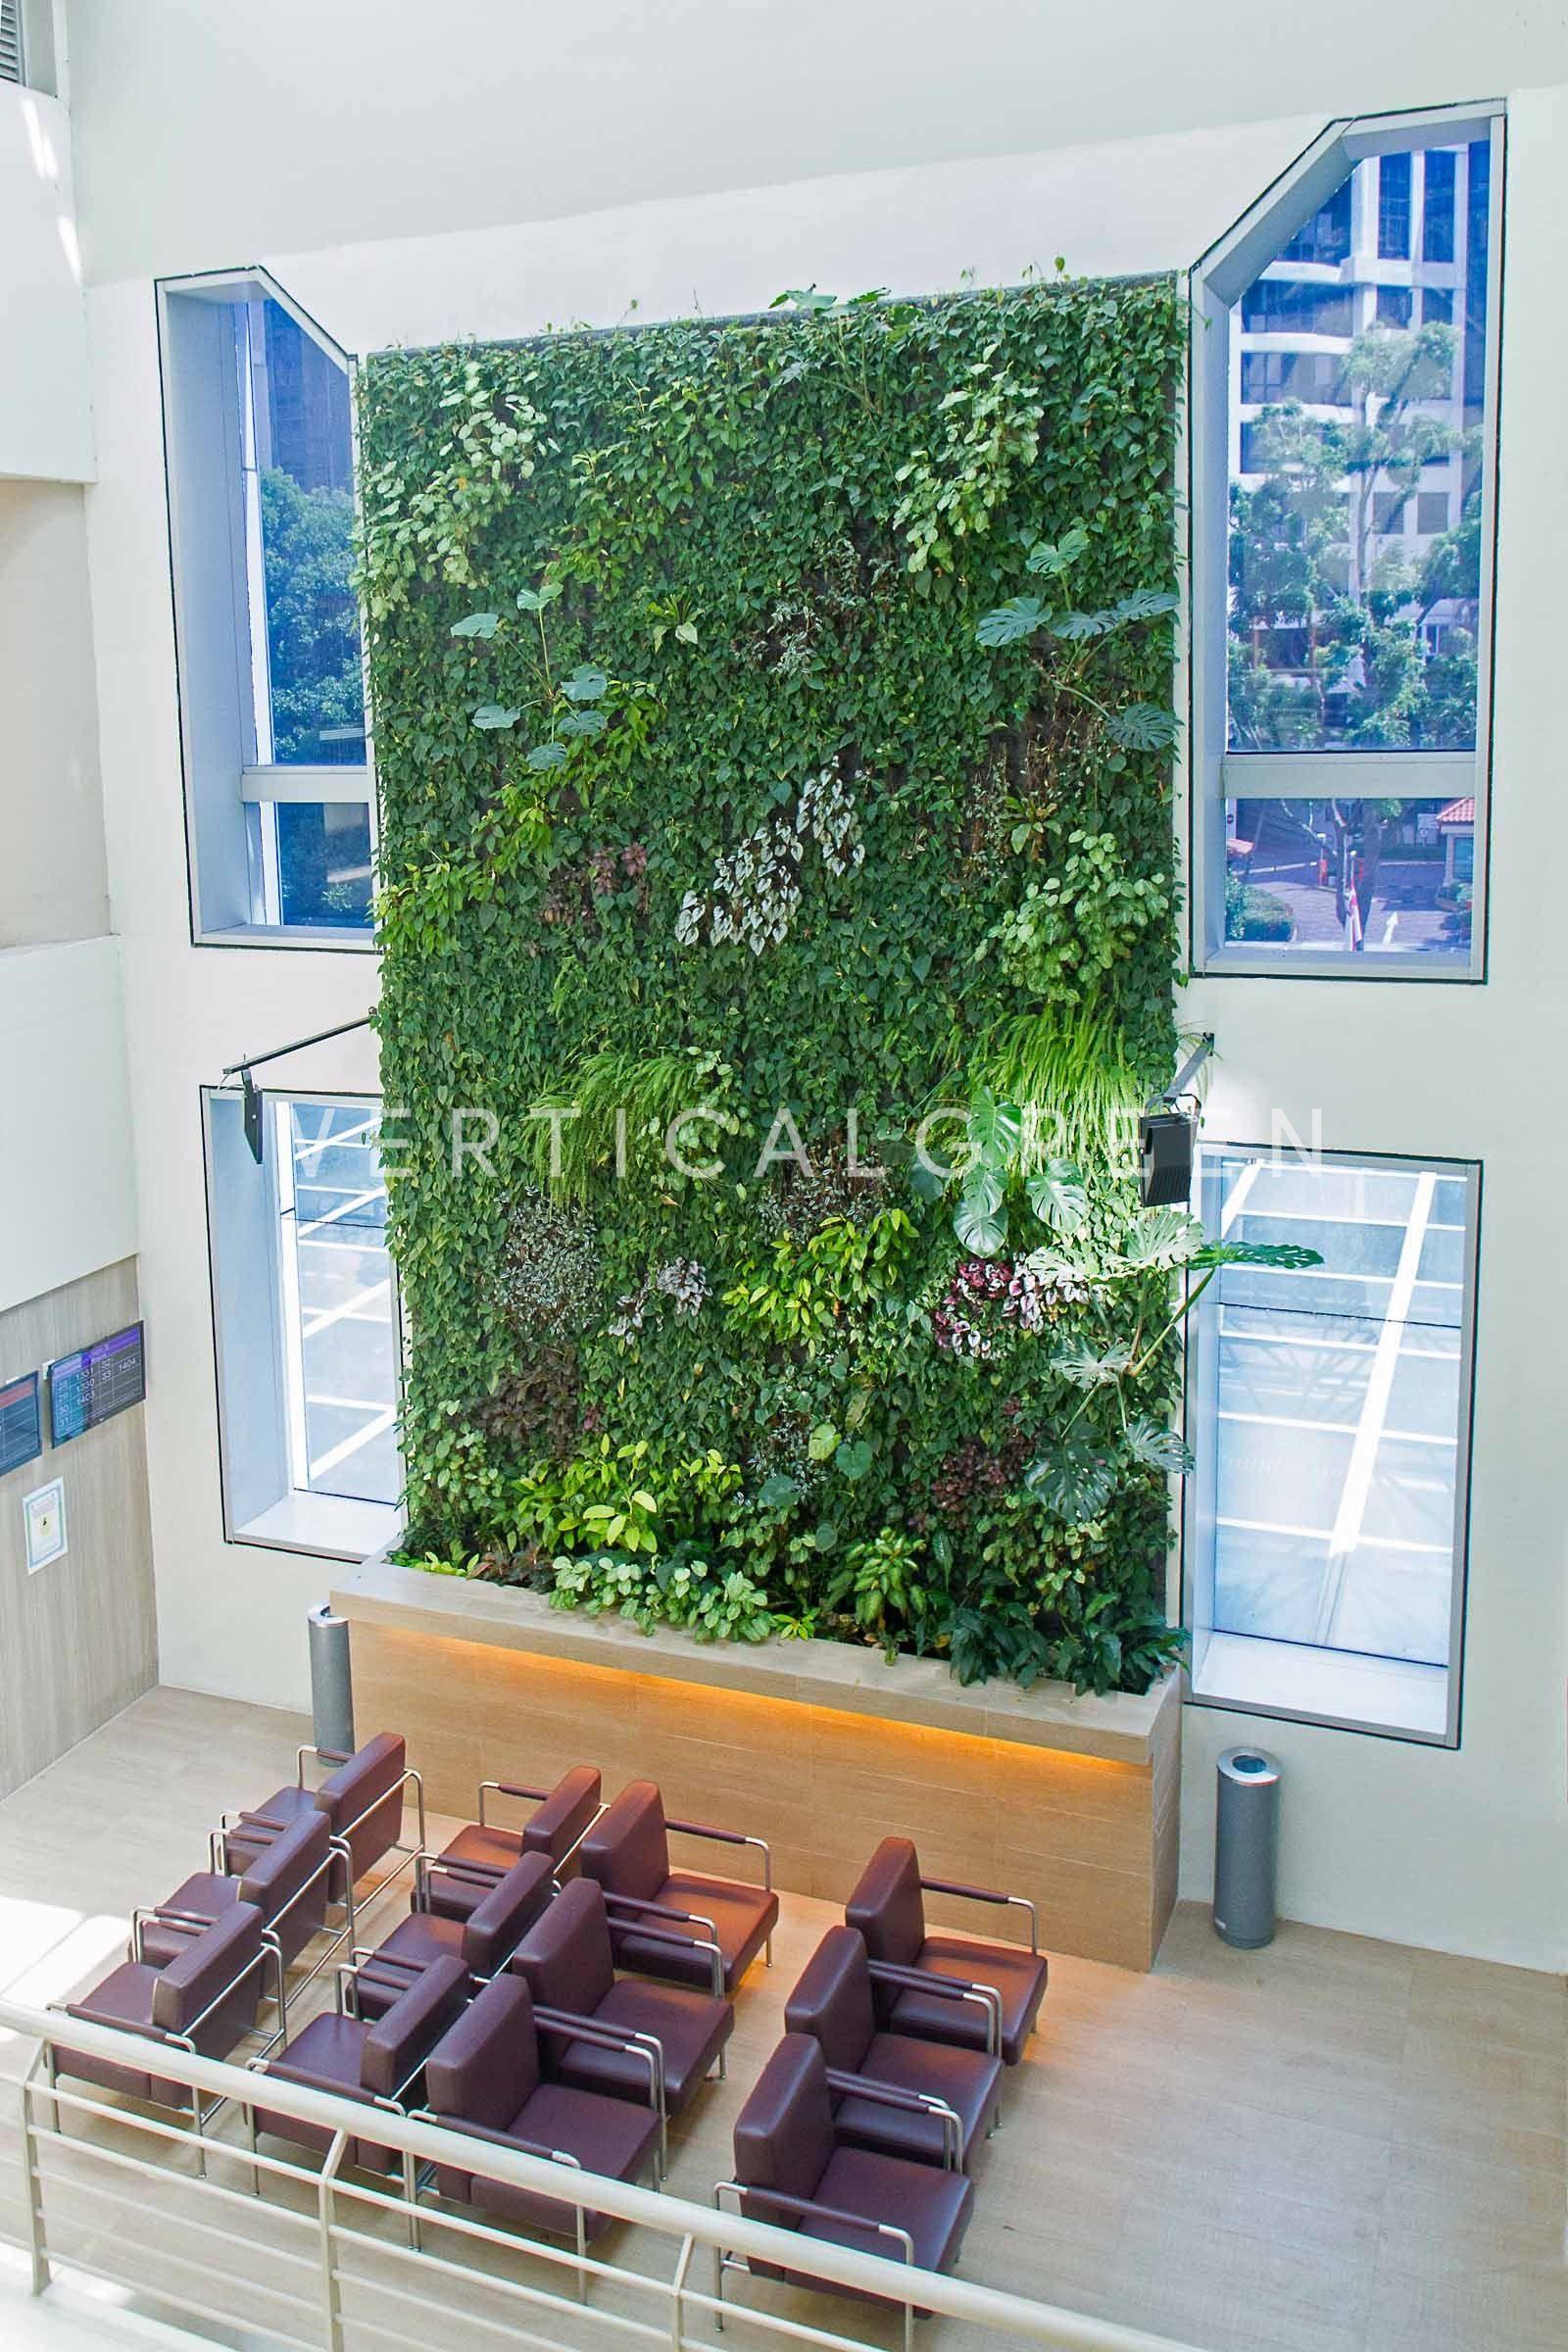 Changi General Hospital Singapore Living Green Wall Vertical Garden Green Wall